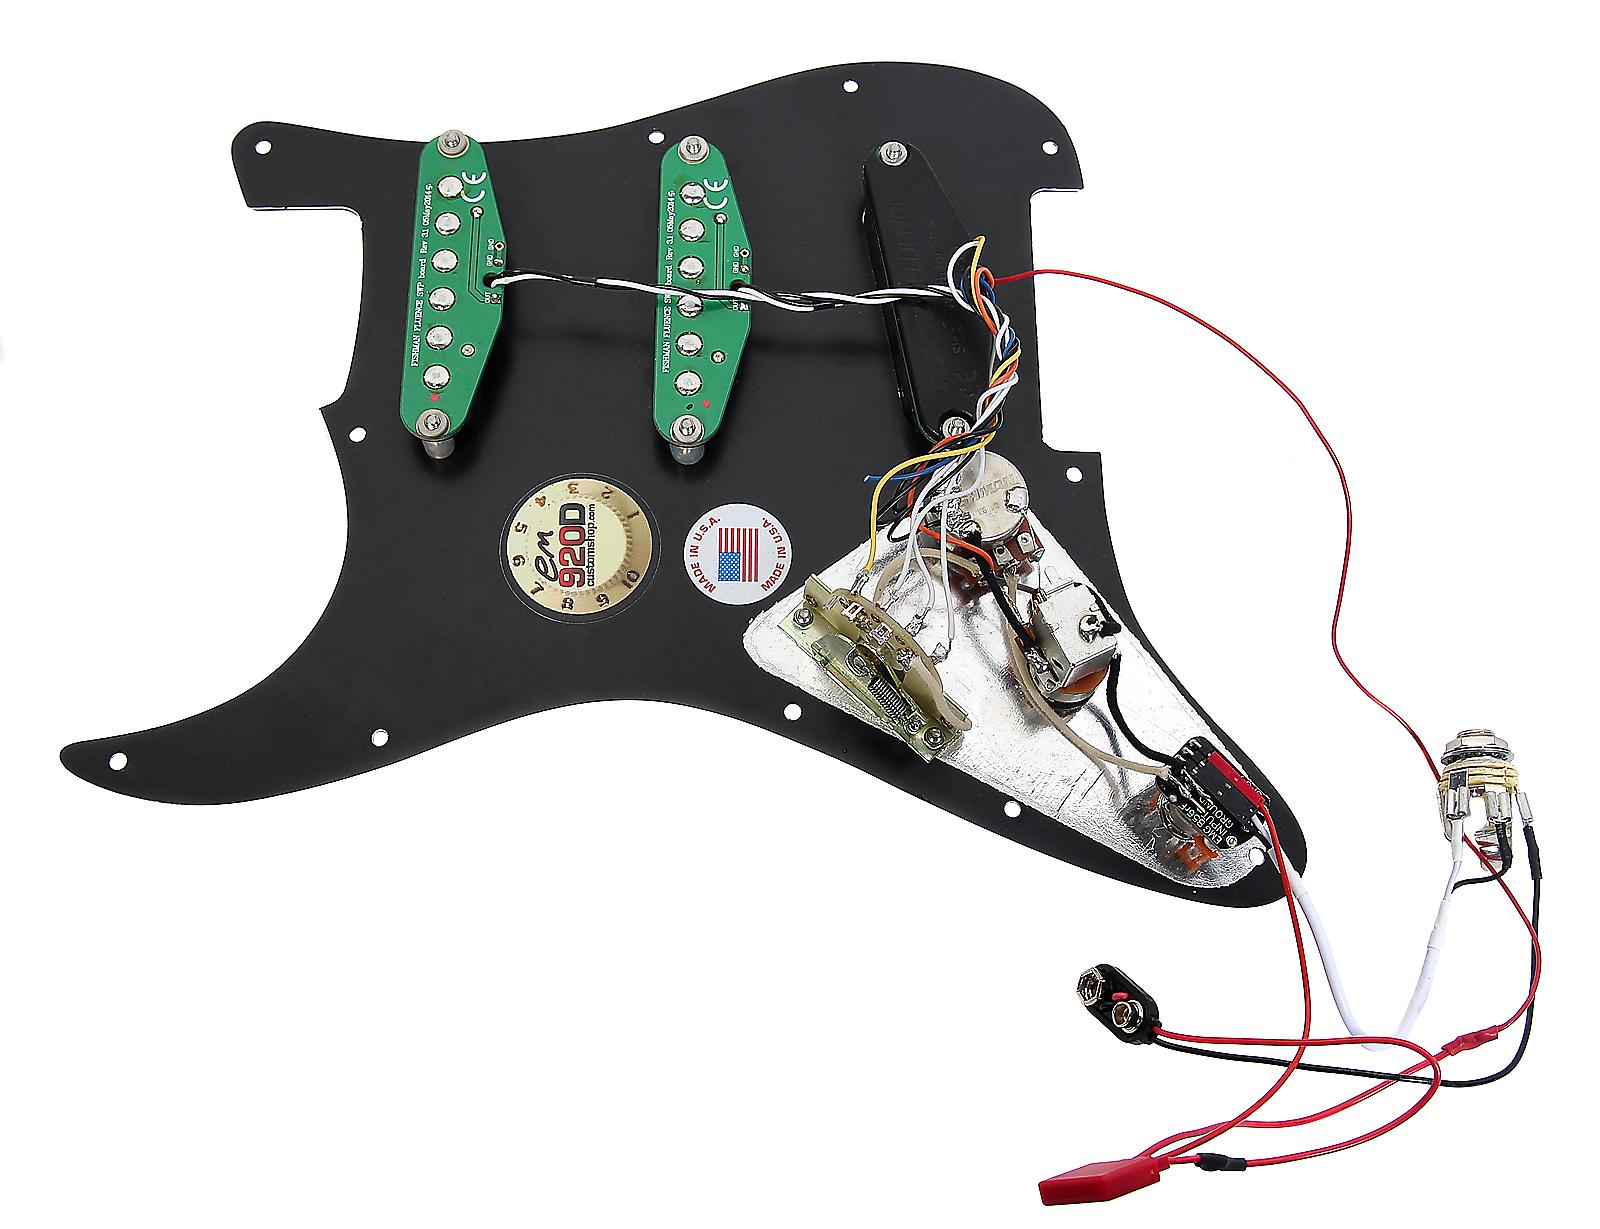 Fishman Fluence Mag Pickups Emg Strat Wiring Diagram Https Reverbcom Item 4038036 Pre Wired Spc Loaded Pickguard For Fender Stratocaster Bk